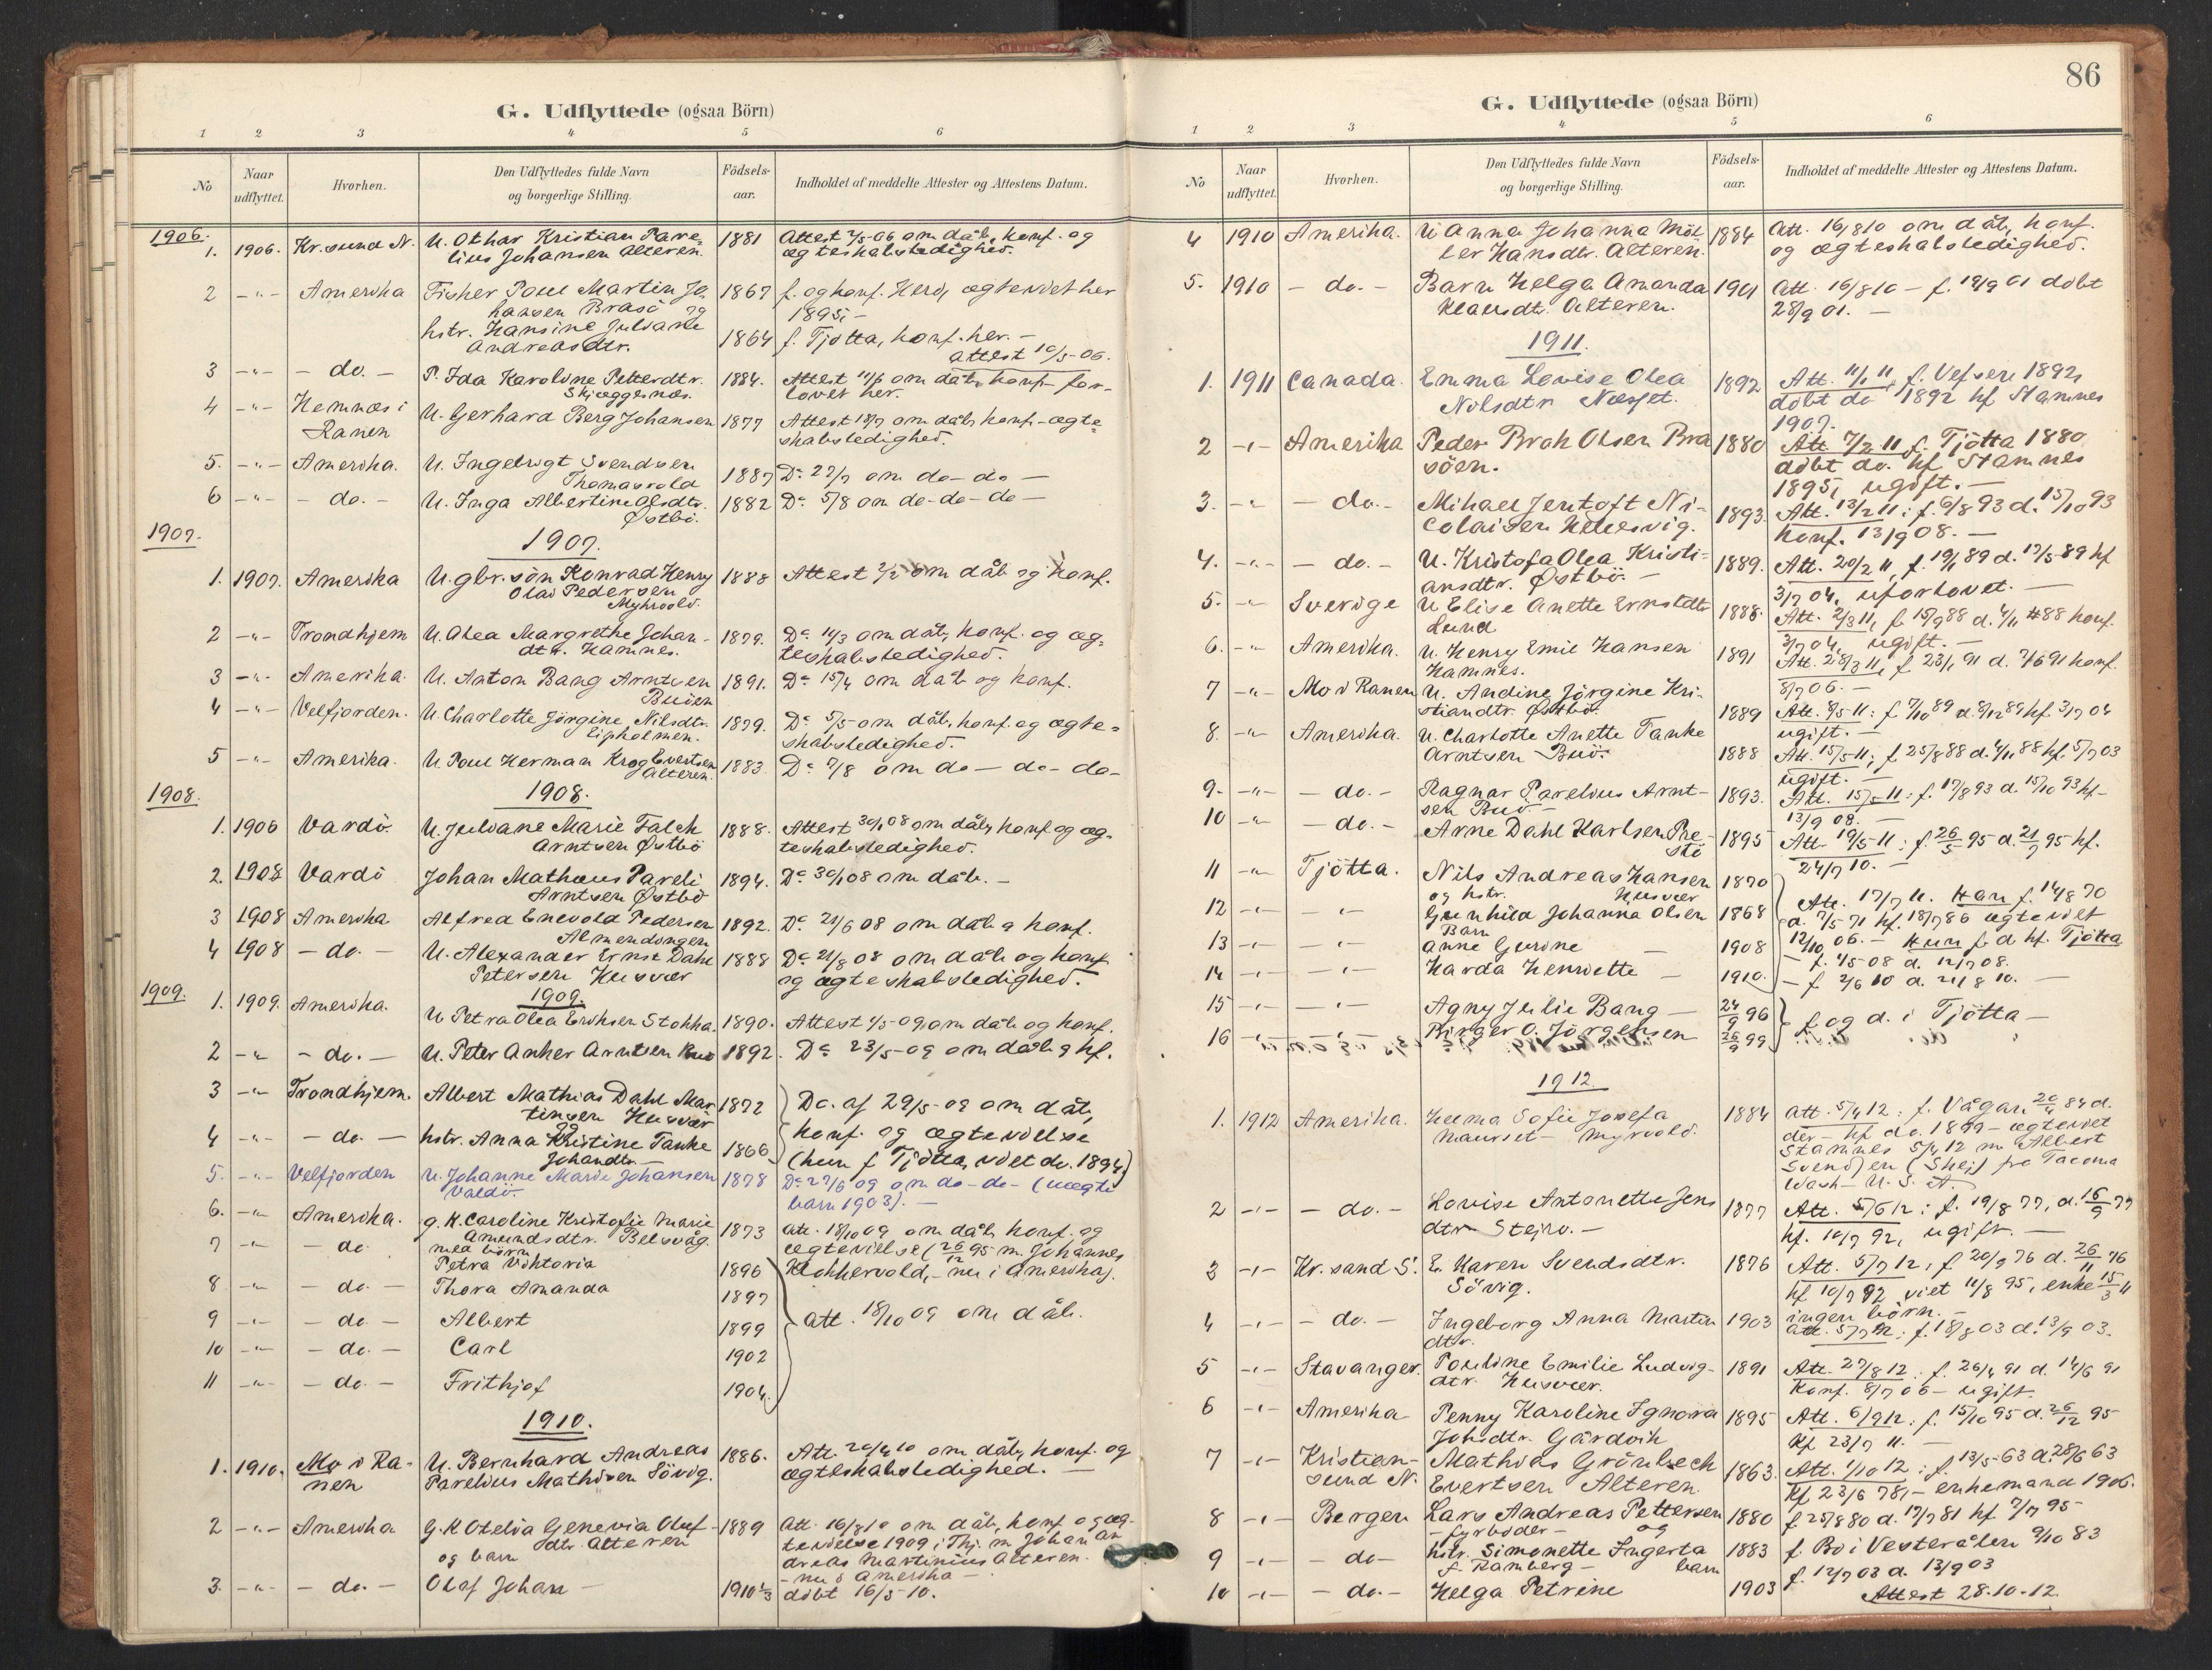 SAT, Ministerialprotokoller, klokkerbøker og fødselsregistre - Nordland, 830/L0454: Ministerialbok nr. 830A18, 1897-1913, s. 86